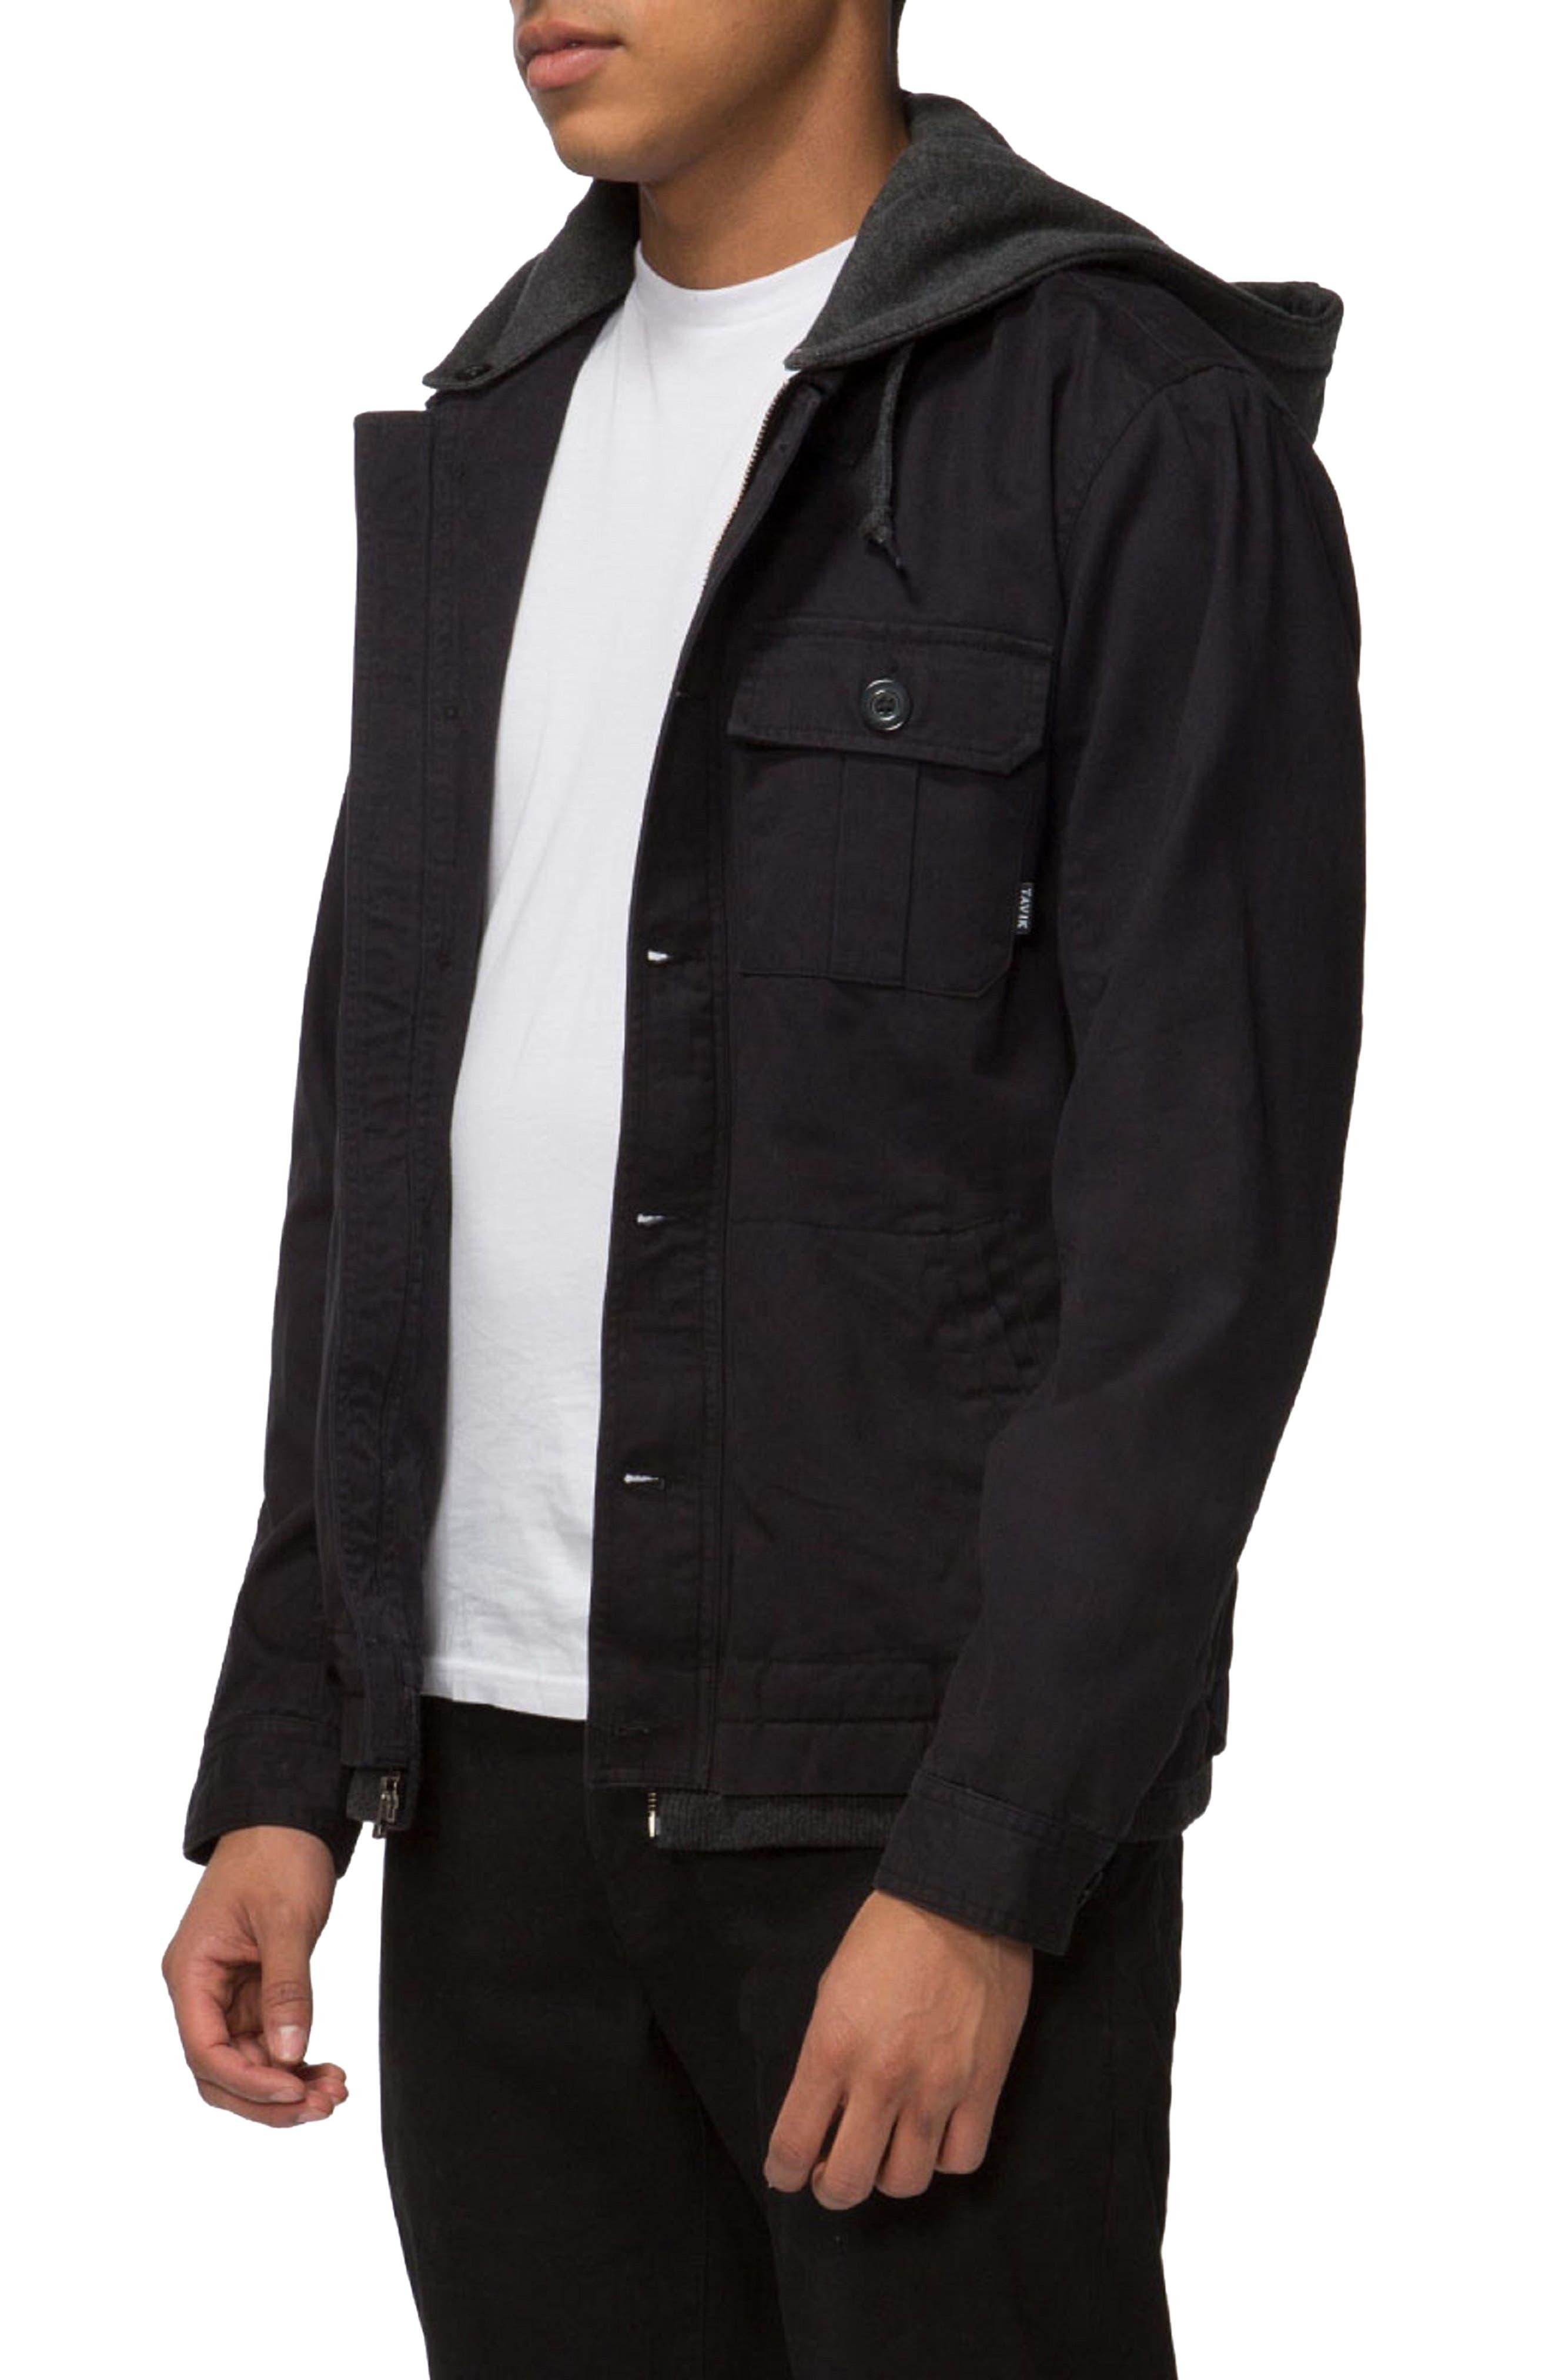 Droogs Field Jacket with Detachable Hood,                             Alternate thumbnail 2, color,                             Black/ Heather Black